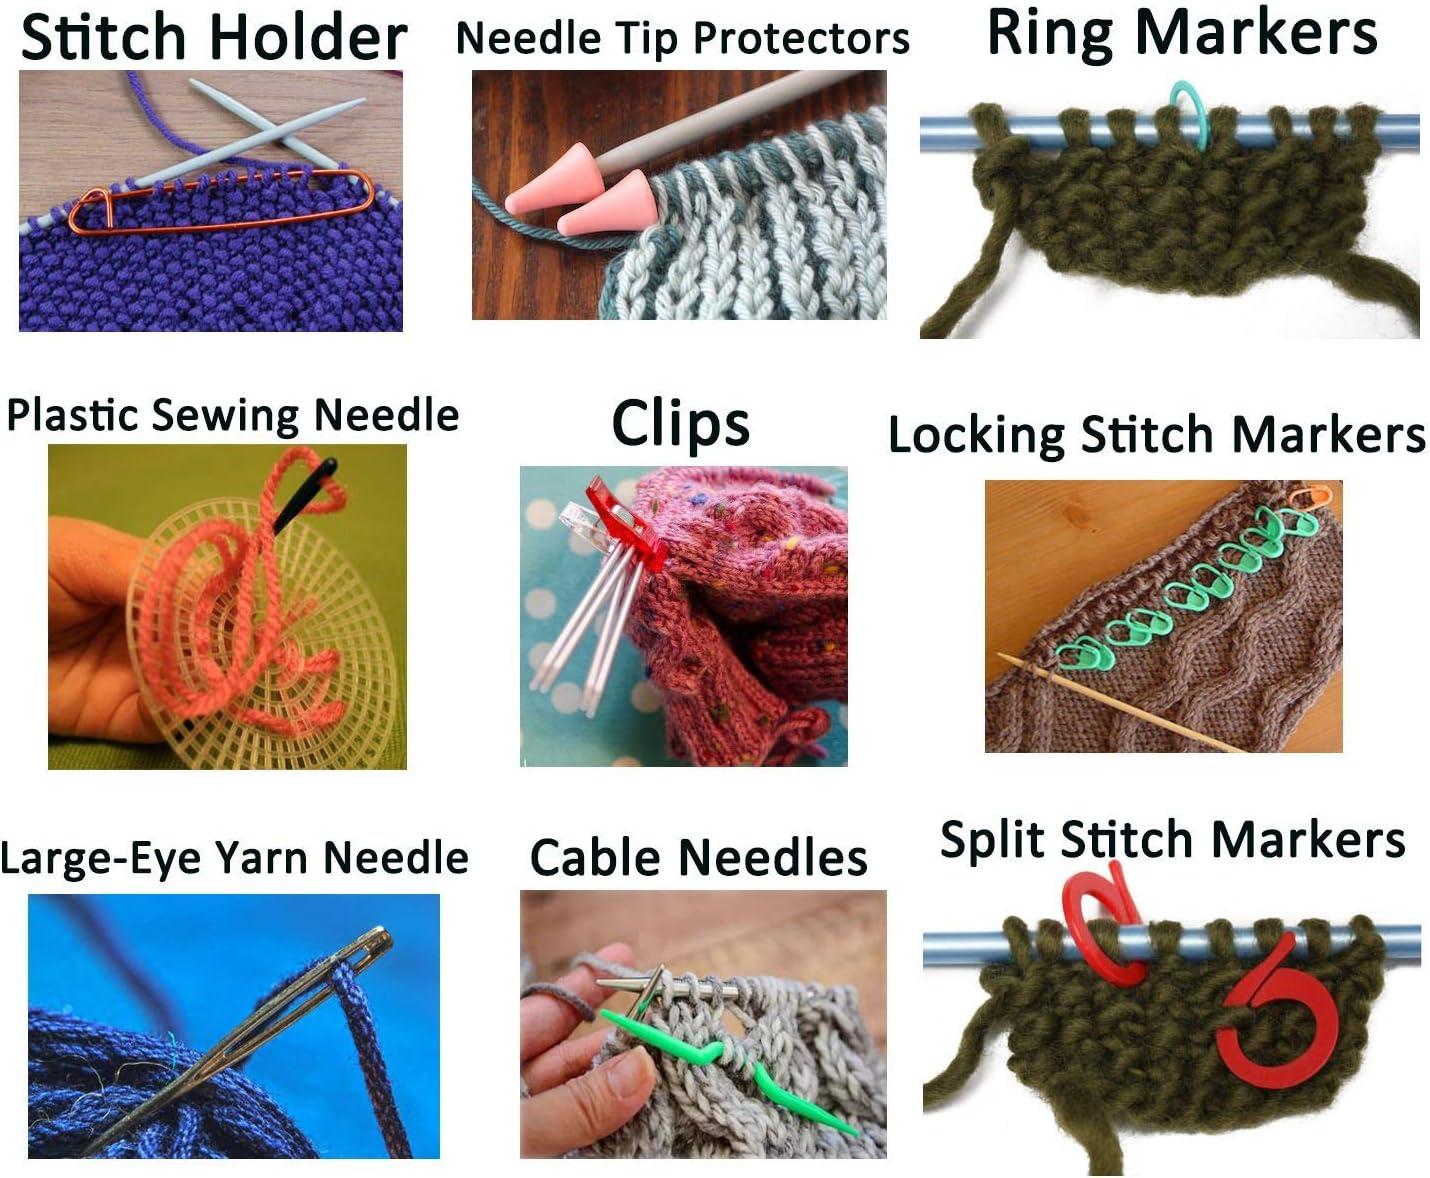 crochet accesories stitch buddies Knitting stitch markers Yarn helper knitting ring Crochet Ring Owl Stitch marker set yarn buddies